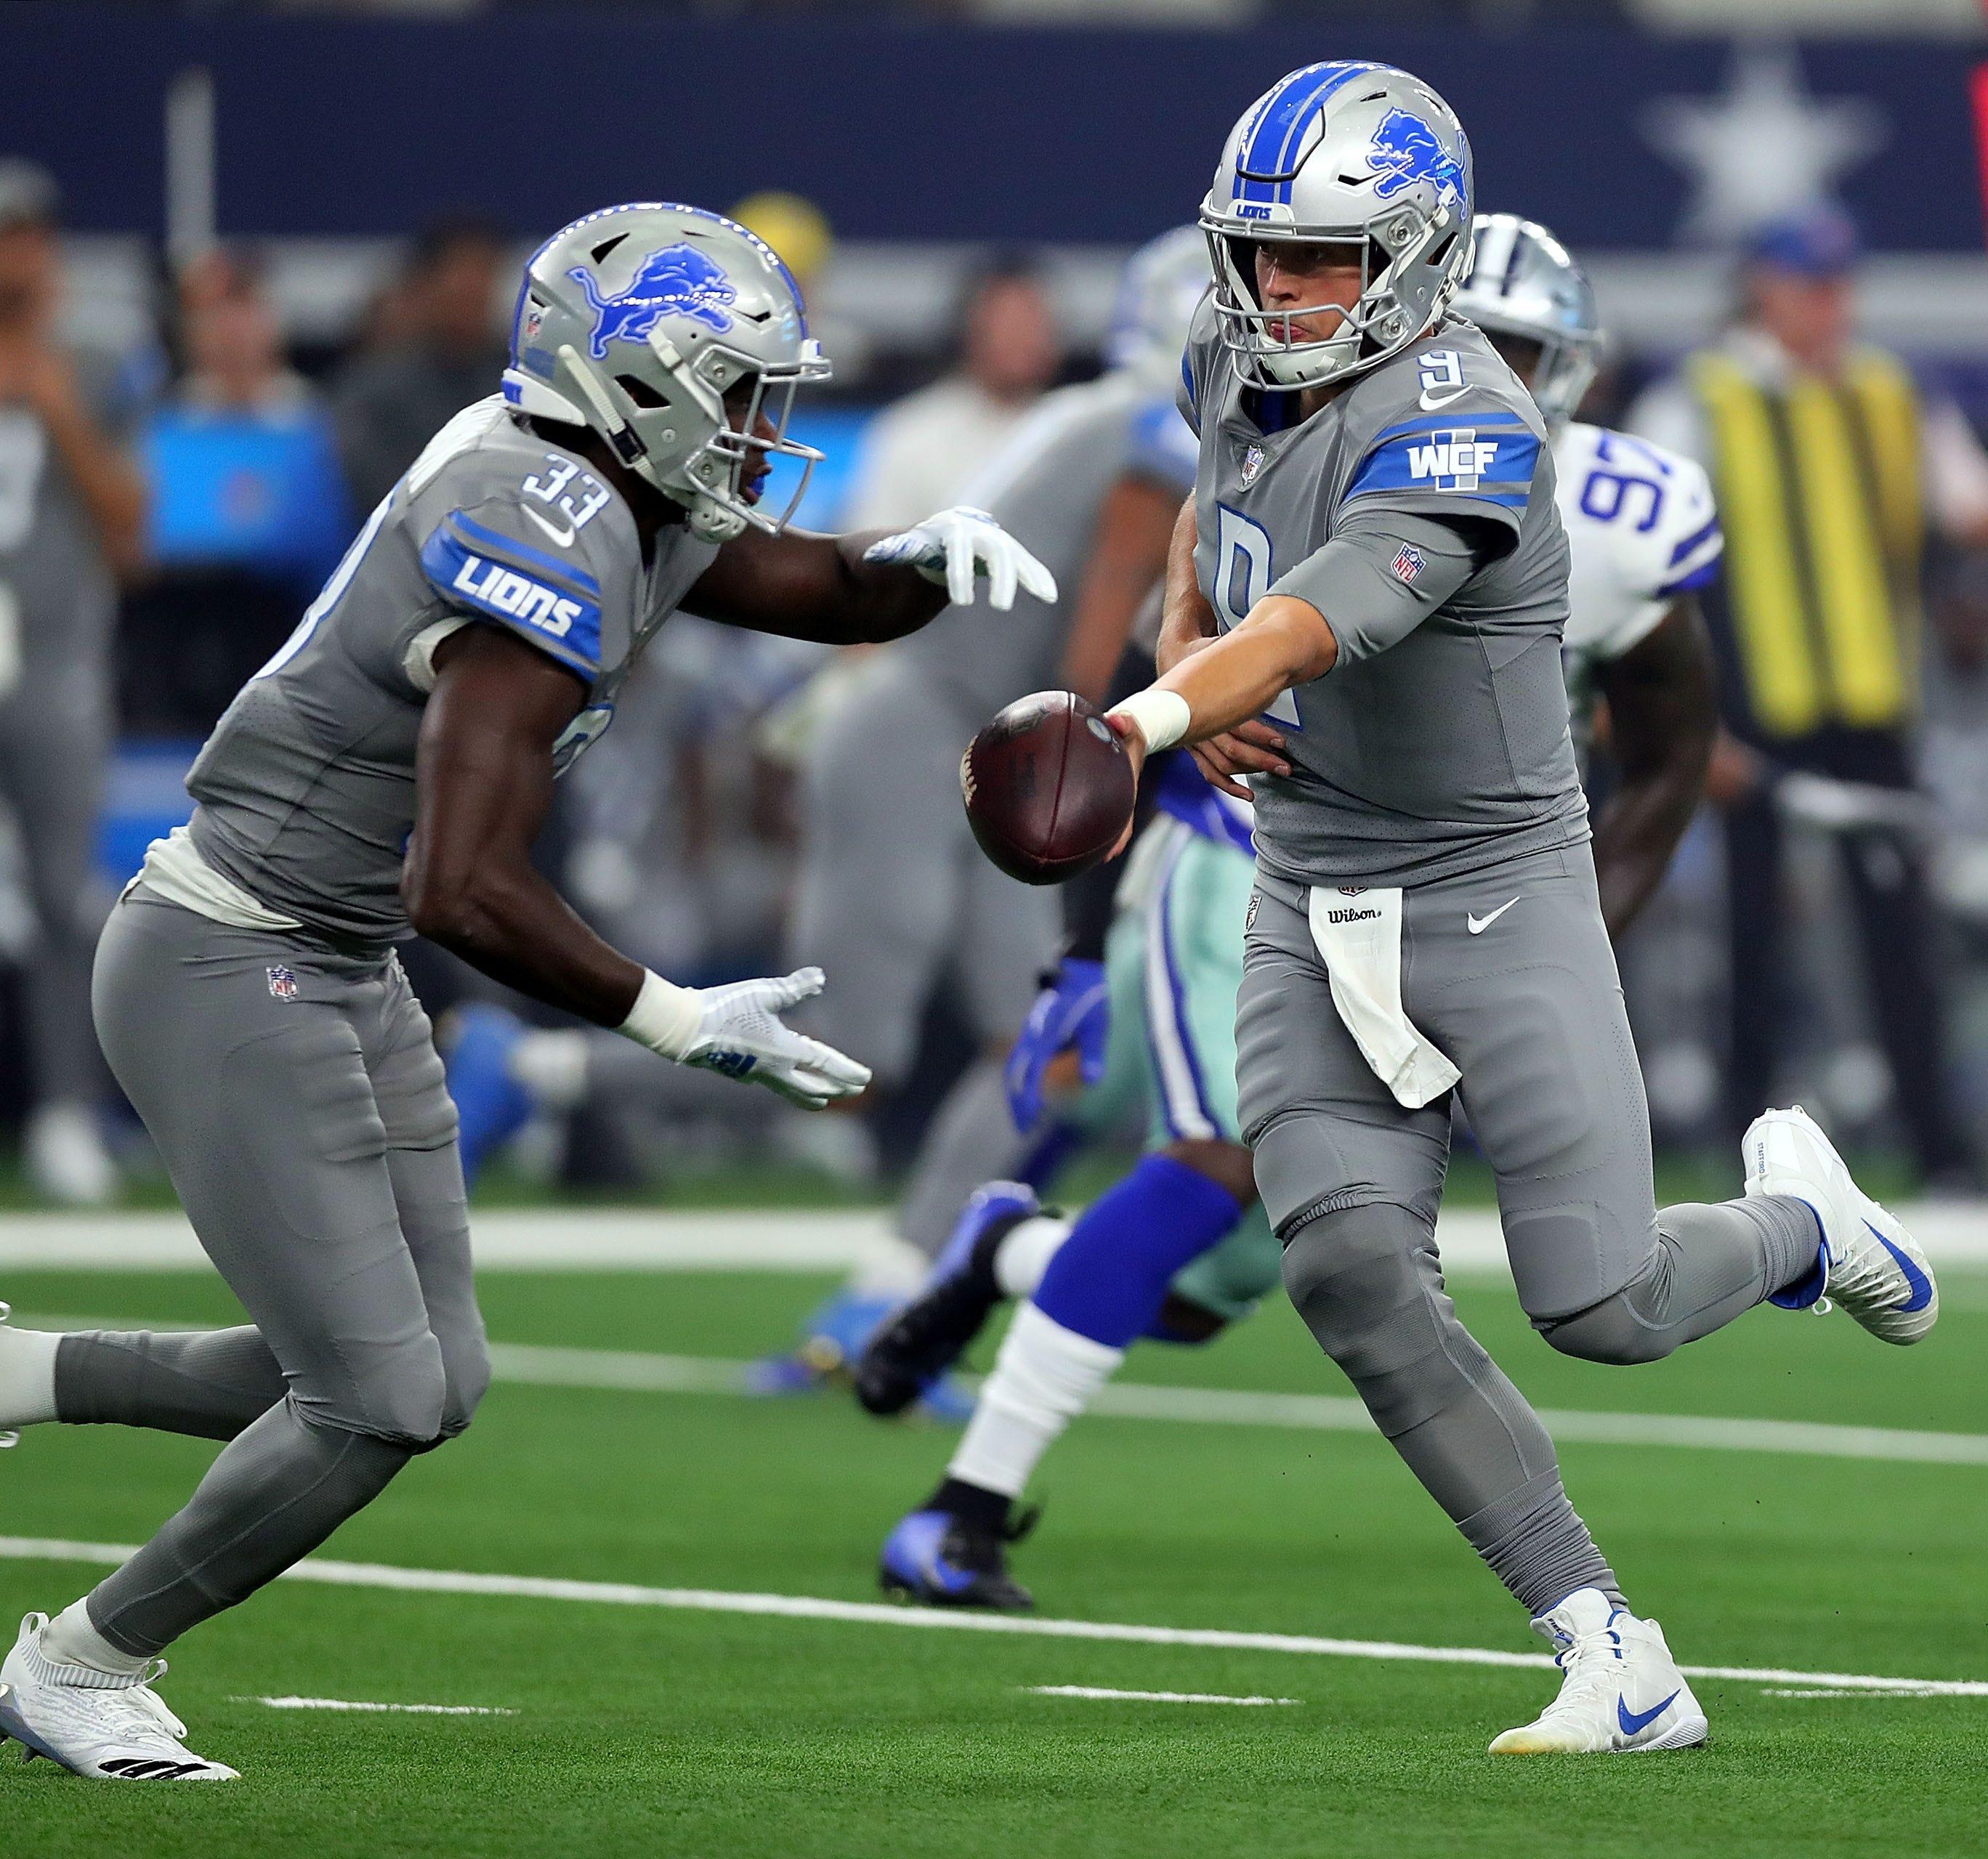 Lions running back Kerryon Johnson takes the handoff from Matthew Stafford in Arlington, Texas, Sunday, Sept. 30, 2018.